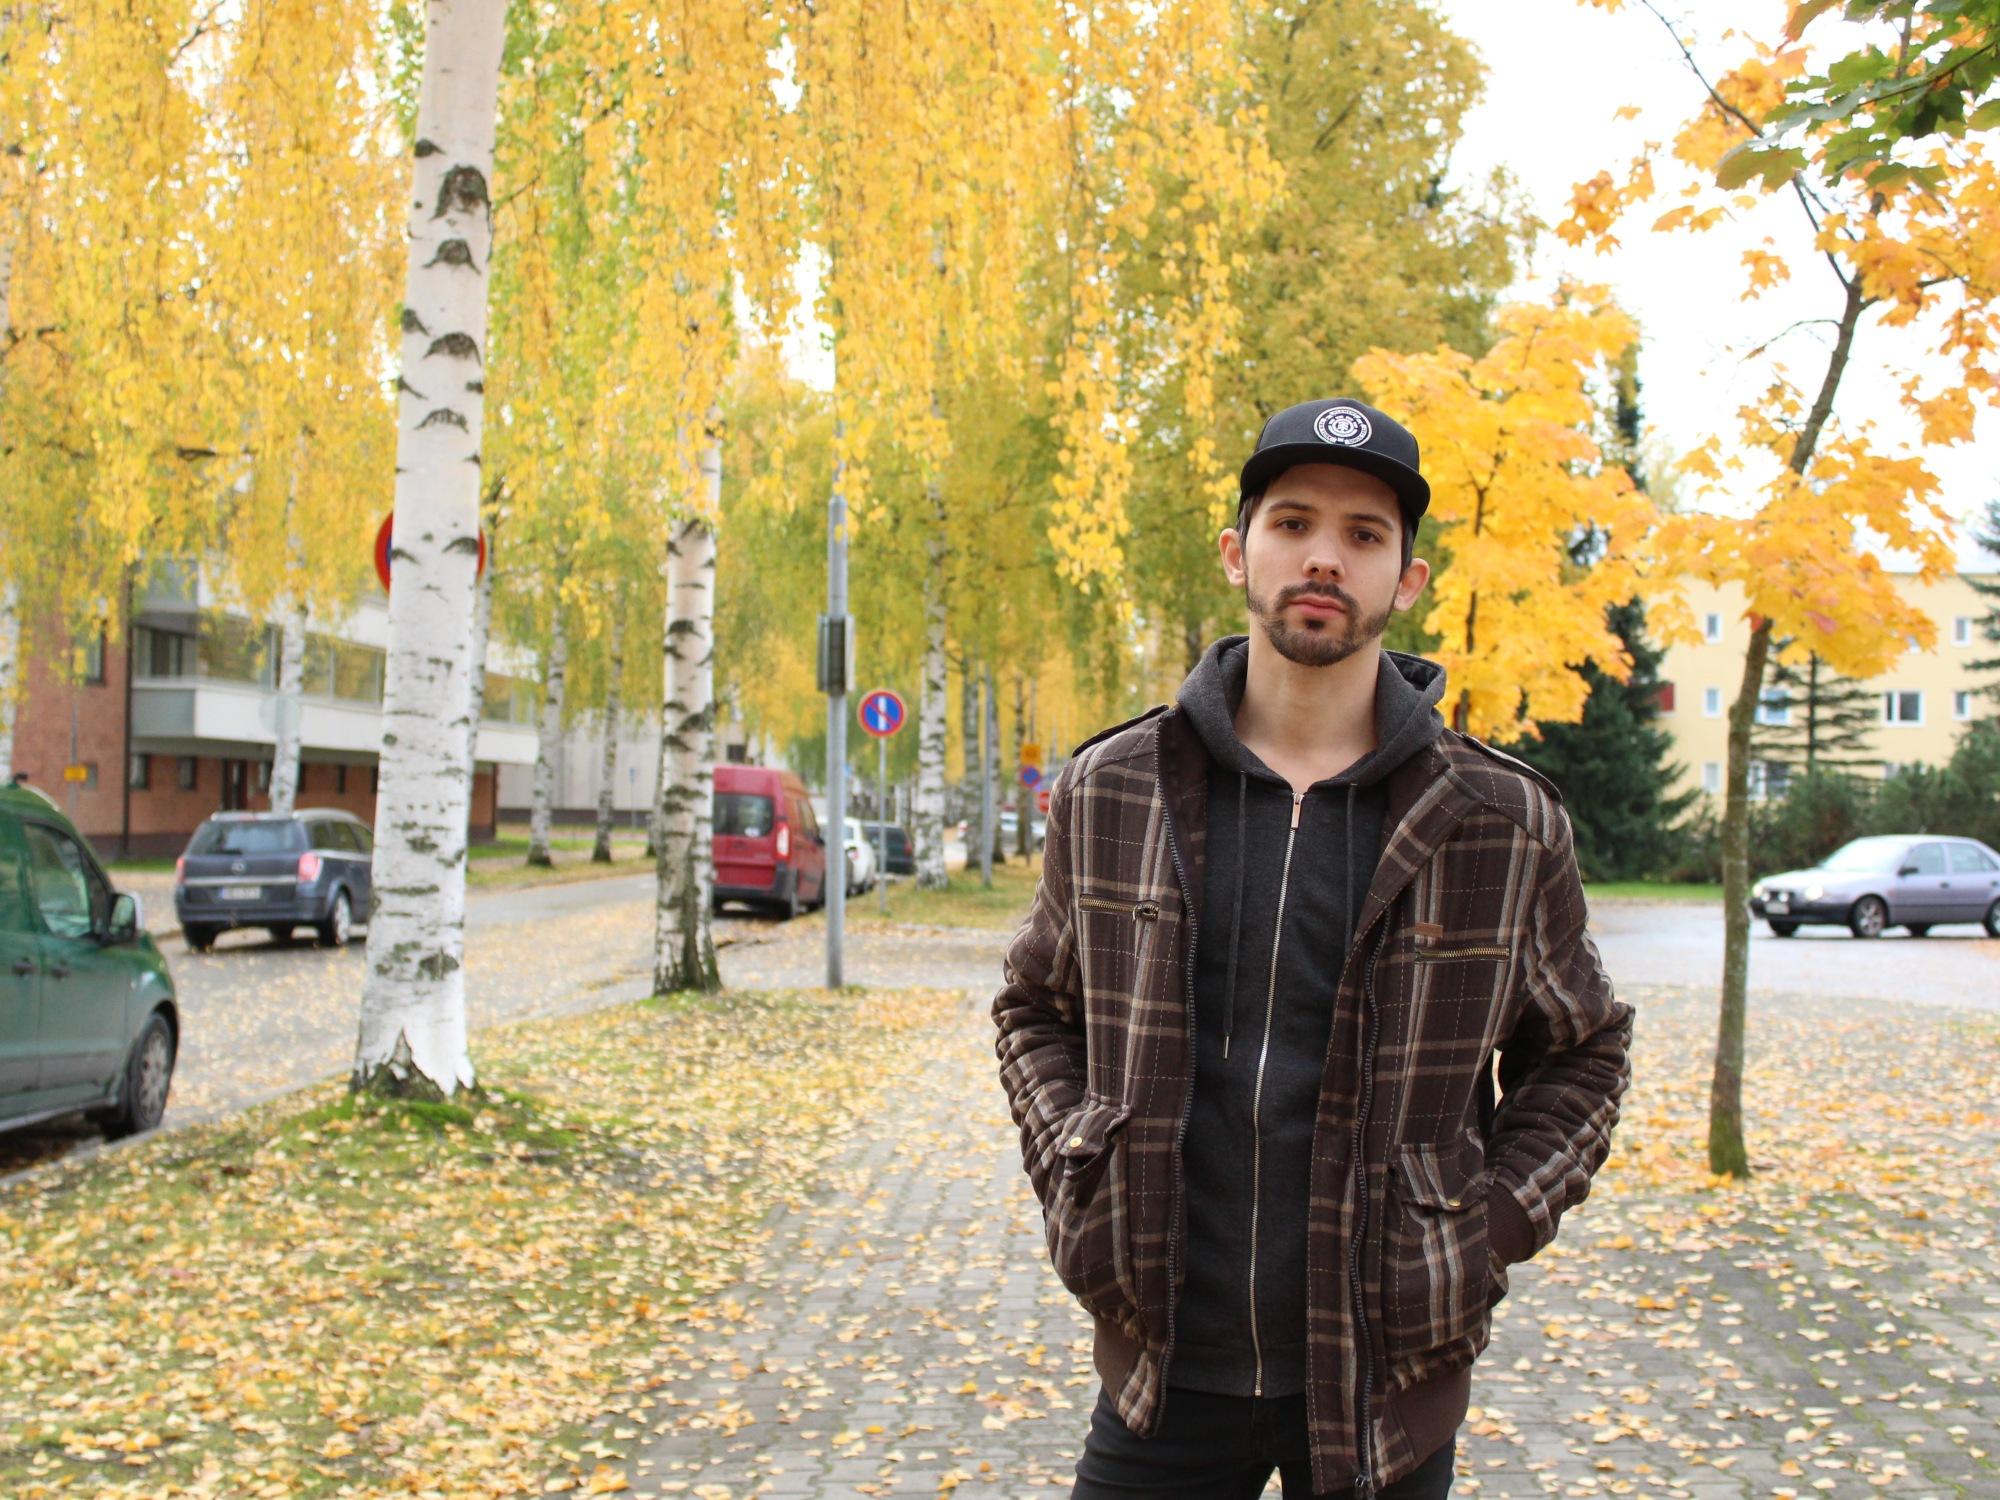 Yury in Joensuu, Finland